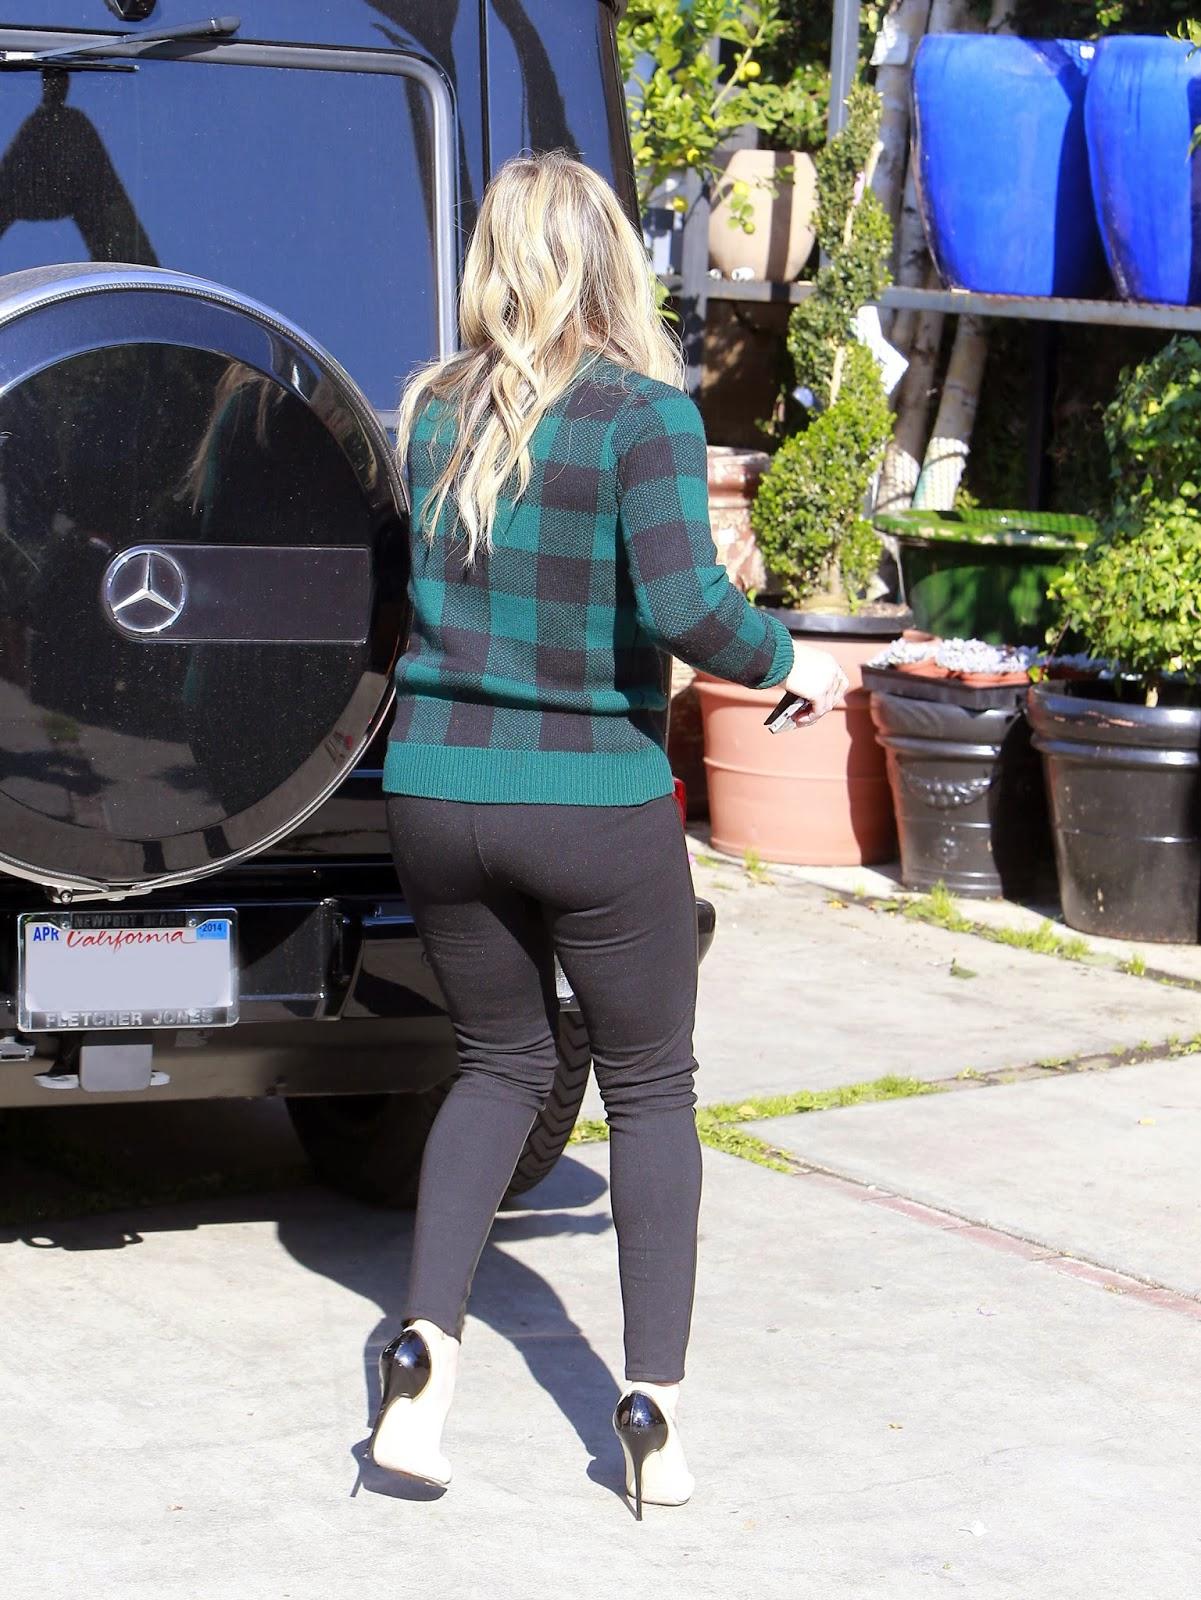 Upskirt Celebs: Hilary Duff needs to sit on my face